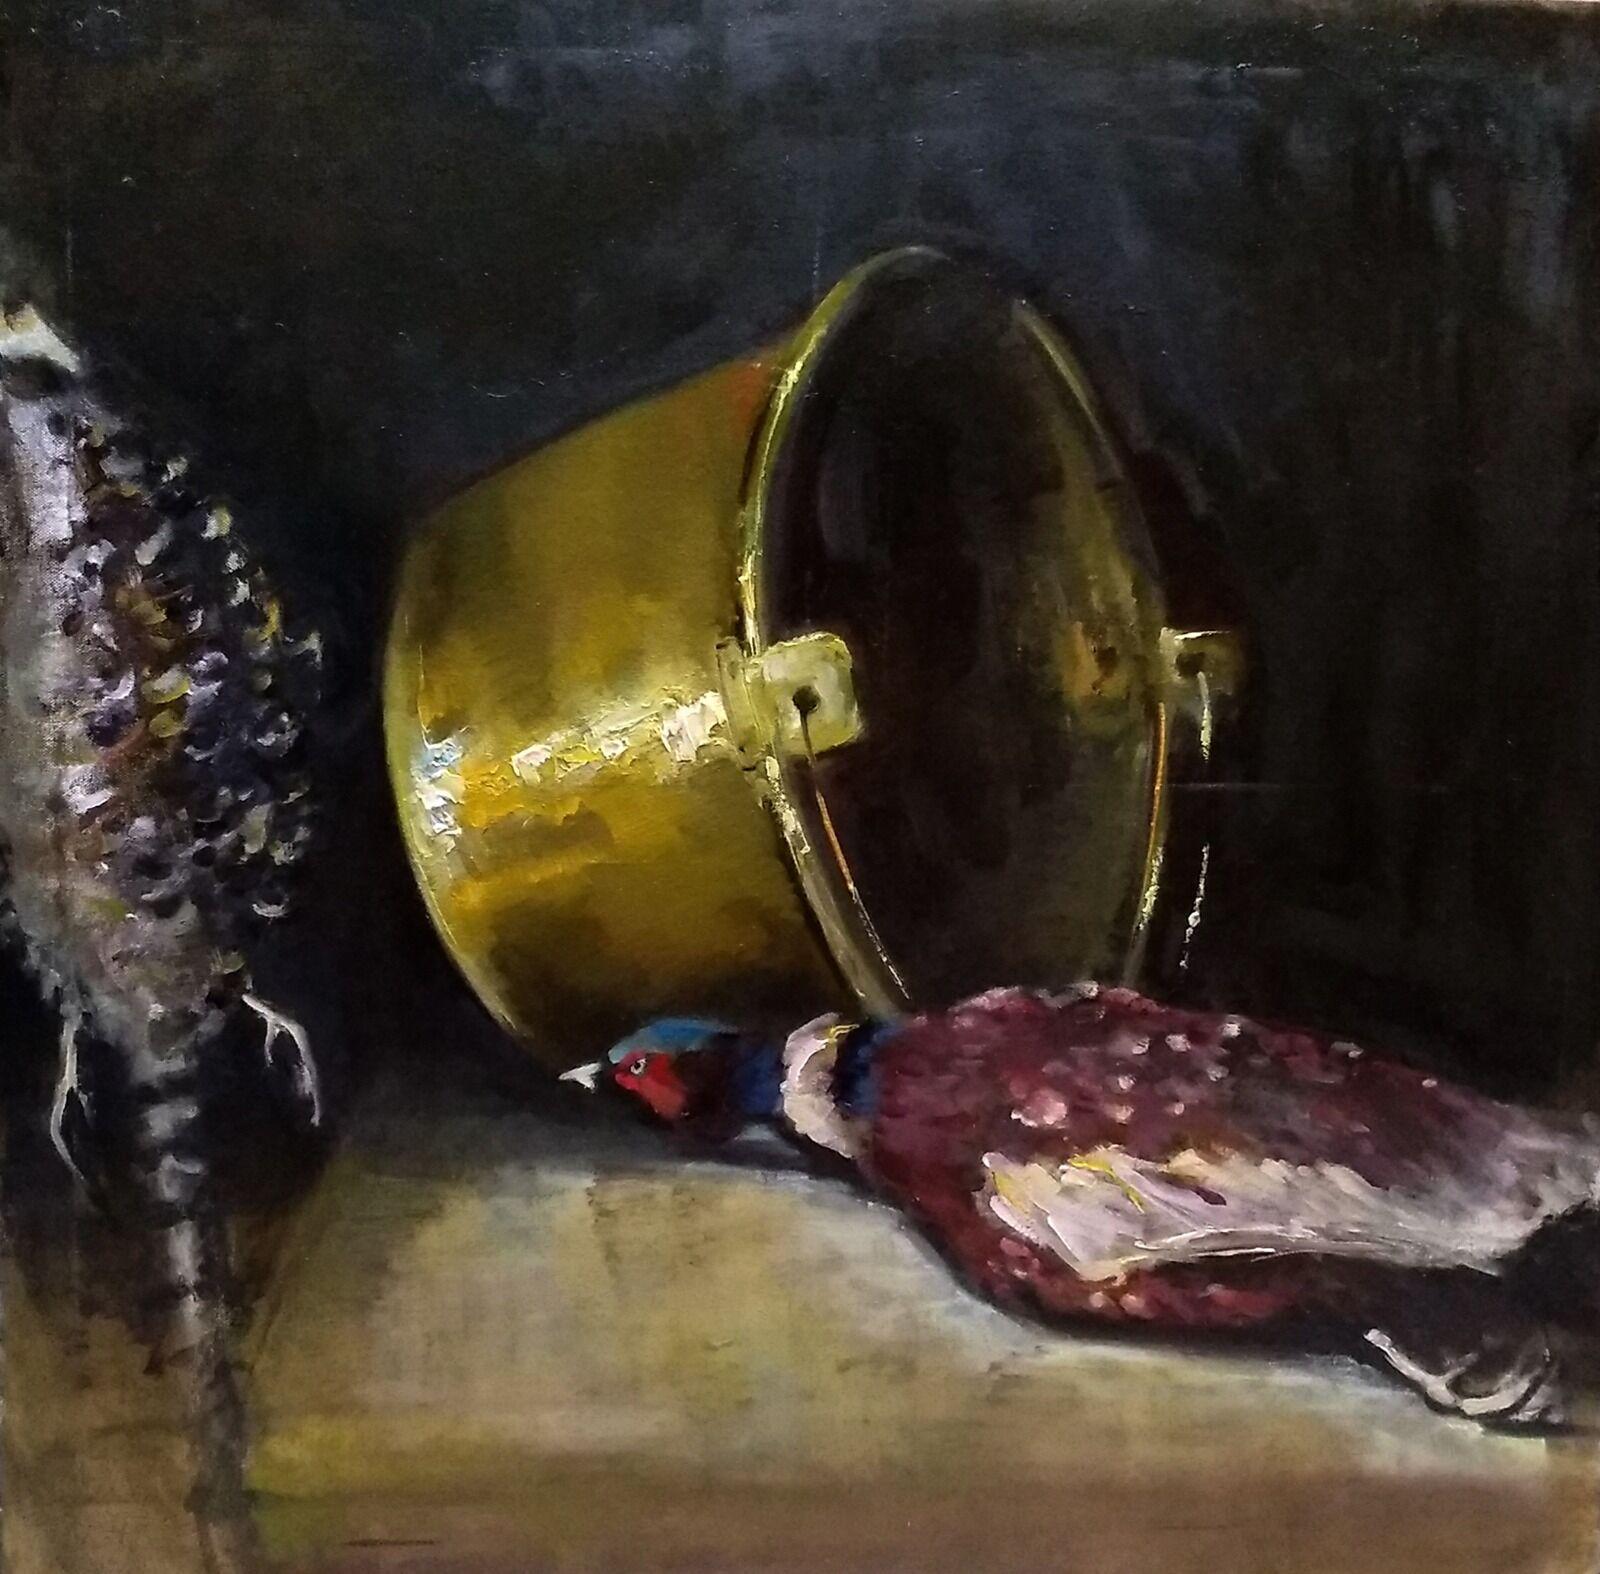 Brass Cauldron with pheasants